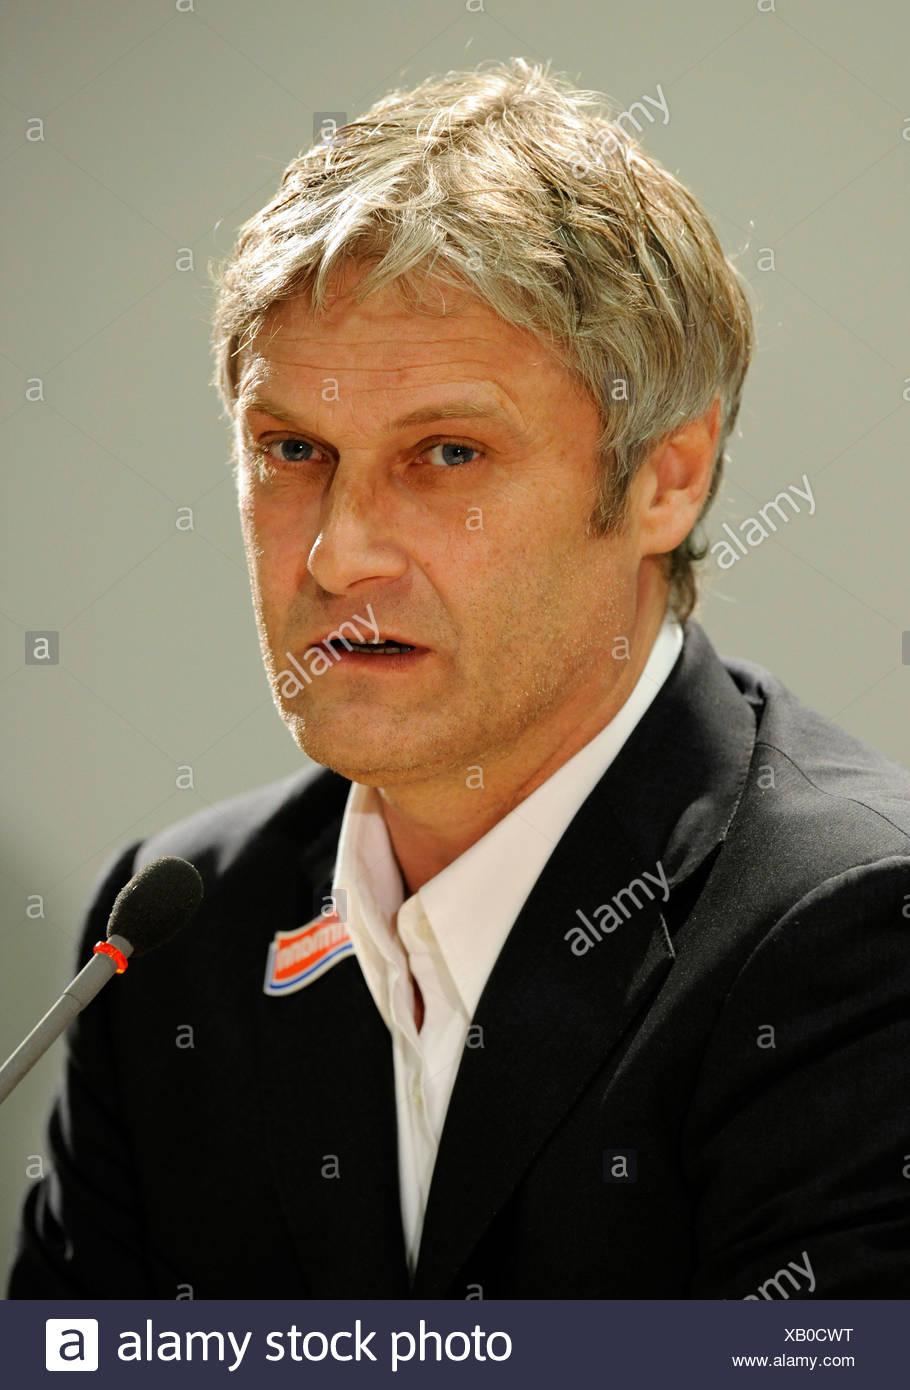 Coach Armin VEH, VfB Stuttgart football club - Stock Image